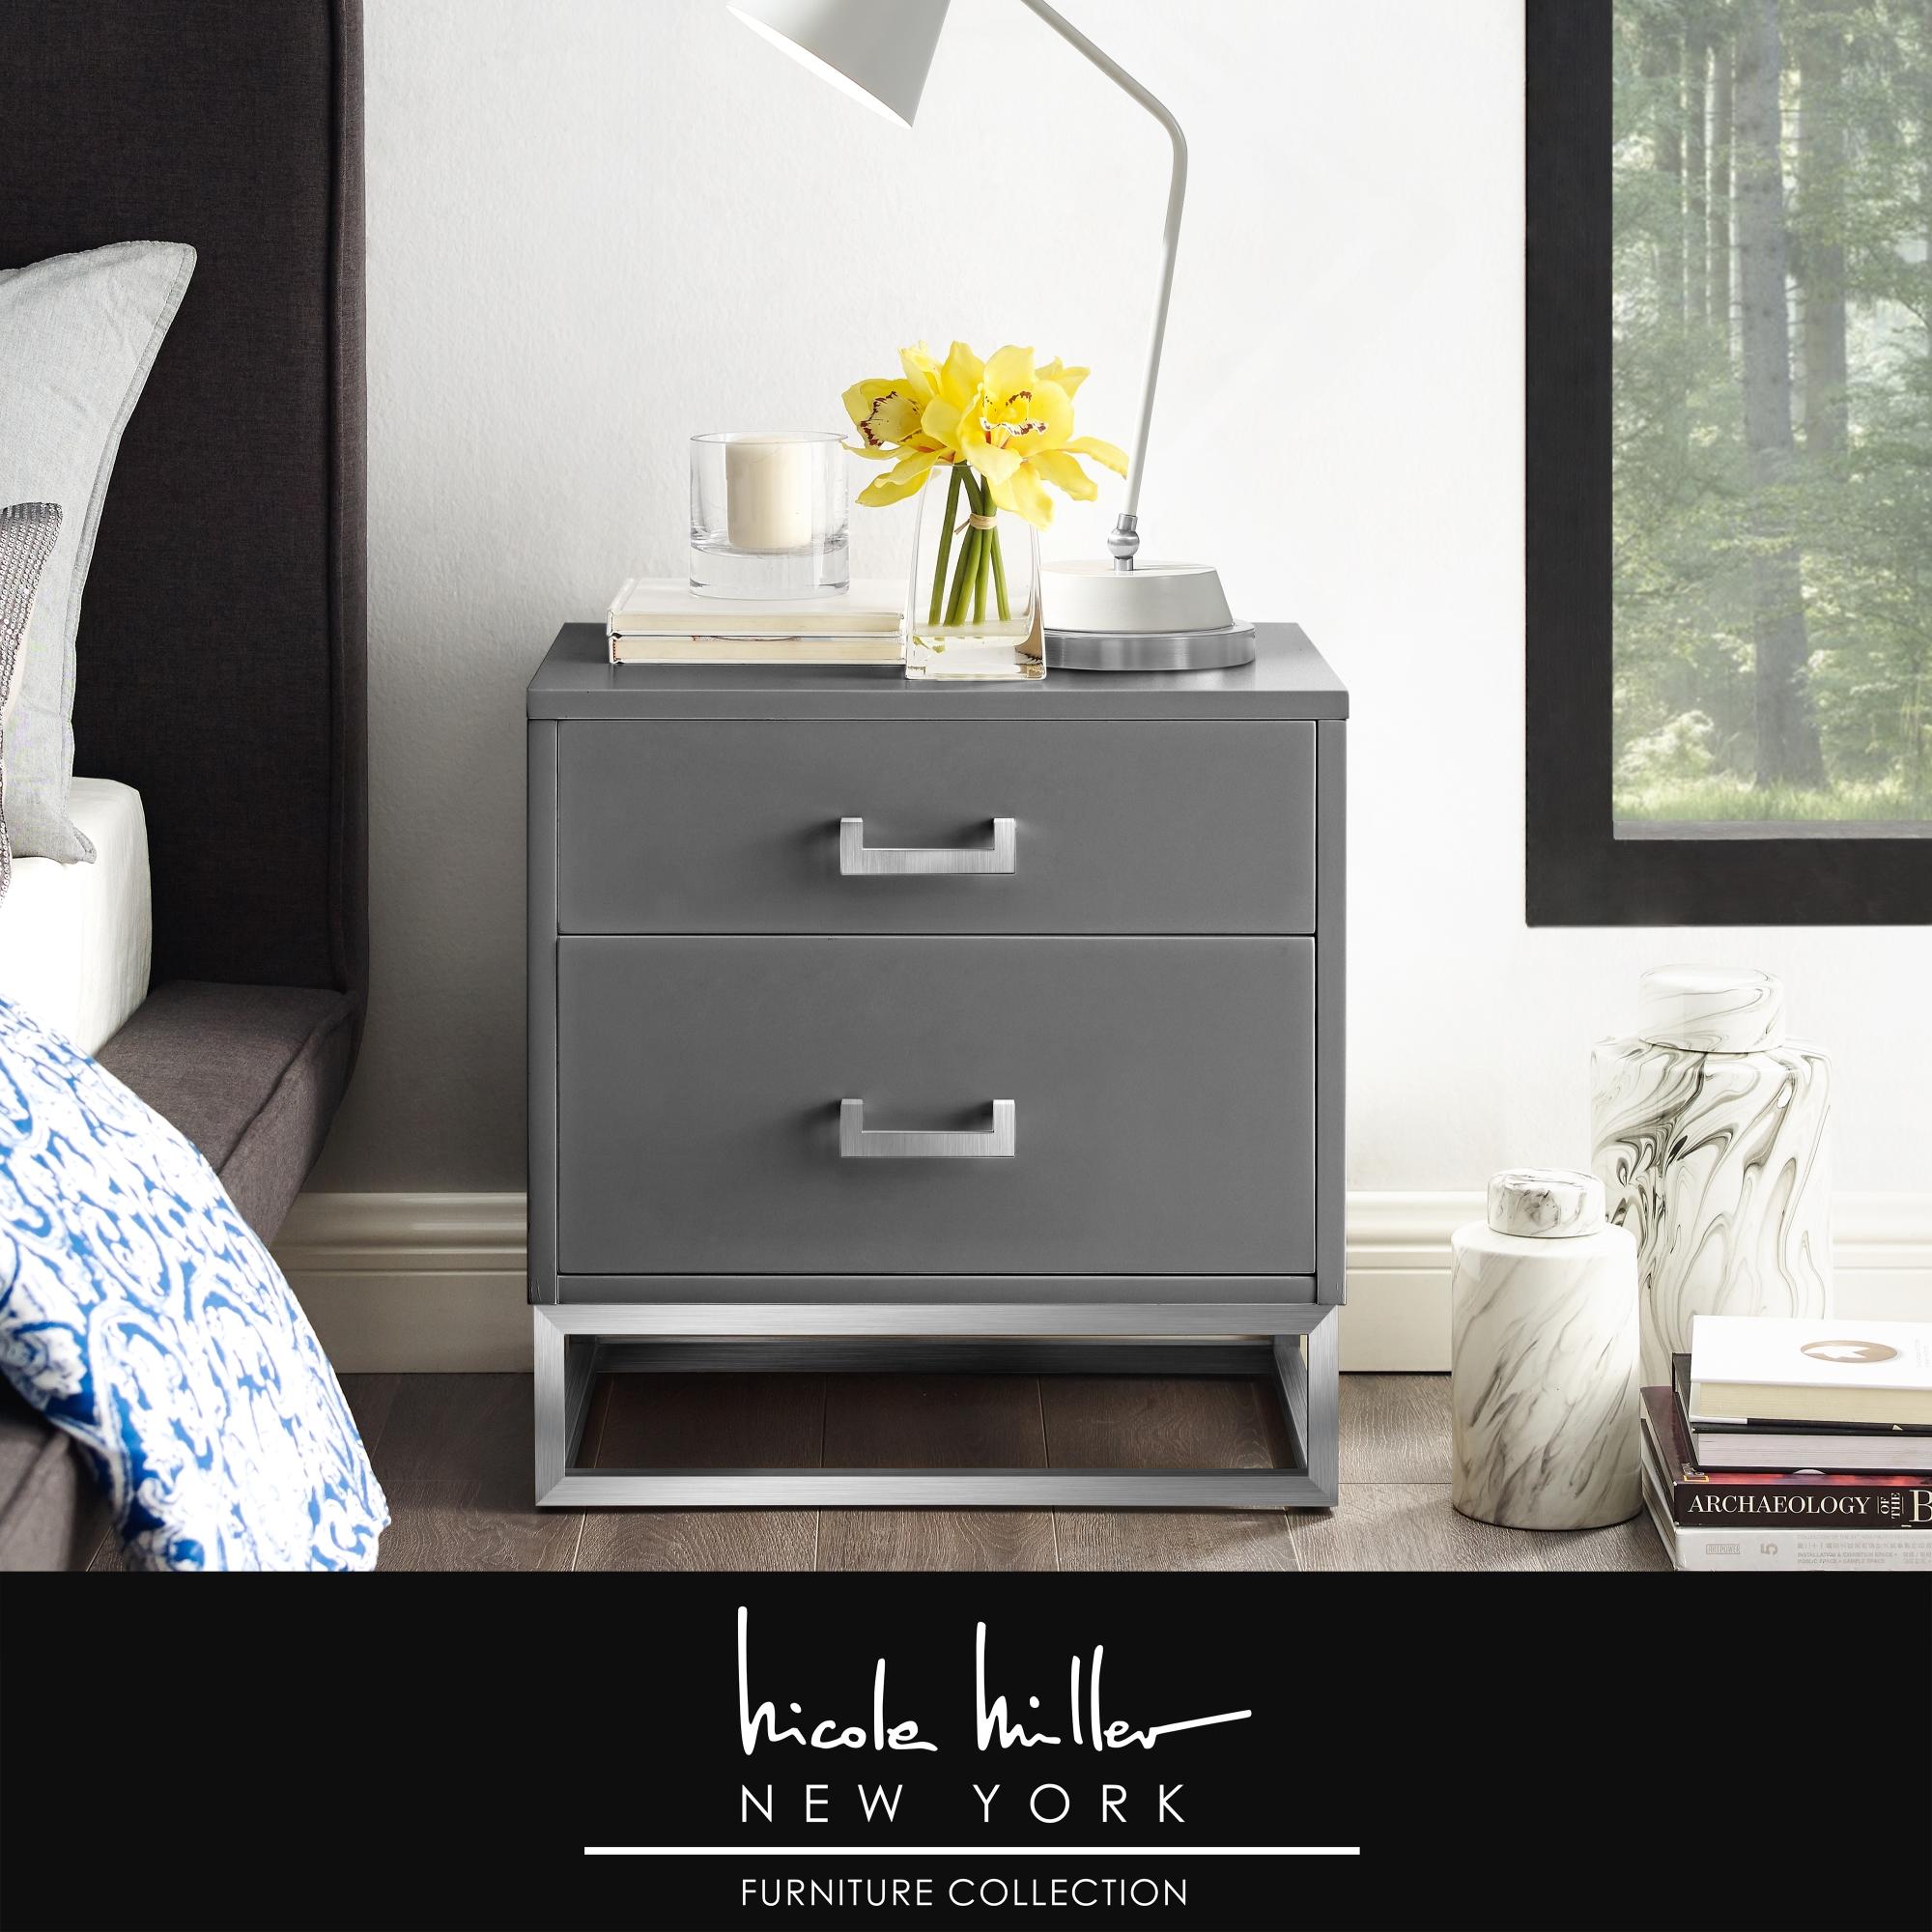 Nicole Miller Dark Grey/Chrome Sidetable 2 Drawers Glossy Handle